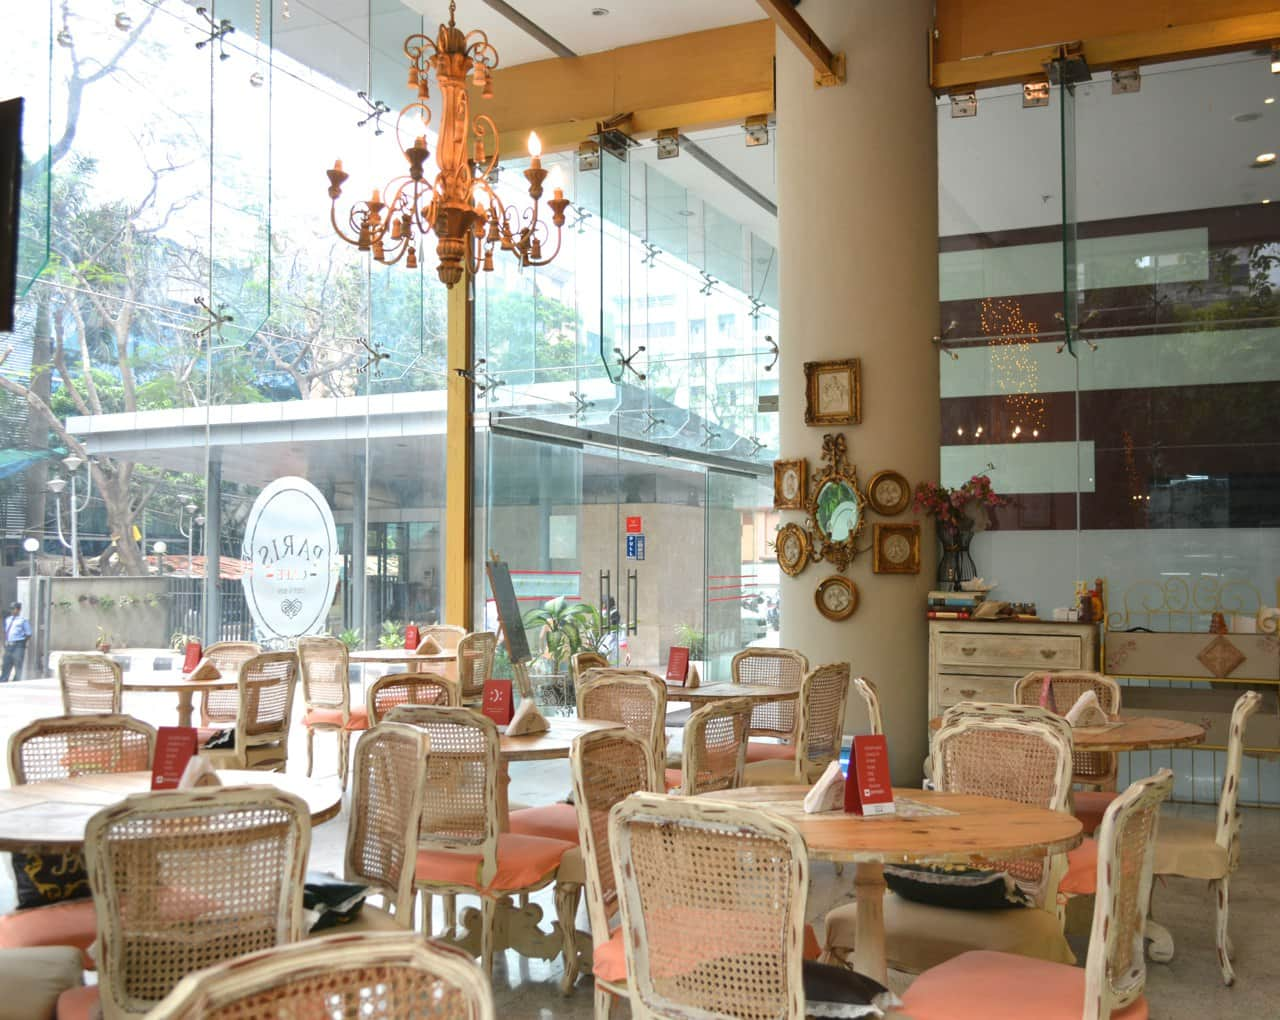 Paris Cafe Sector 5 Salt Lake Kolkata Zomato